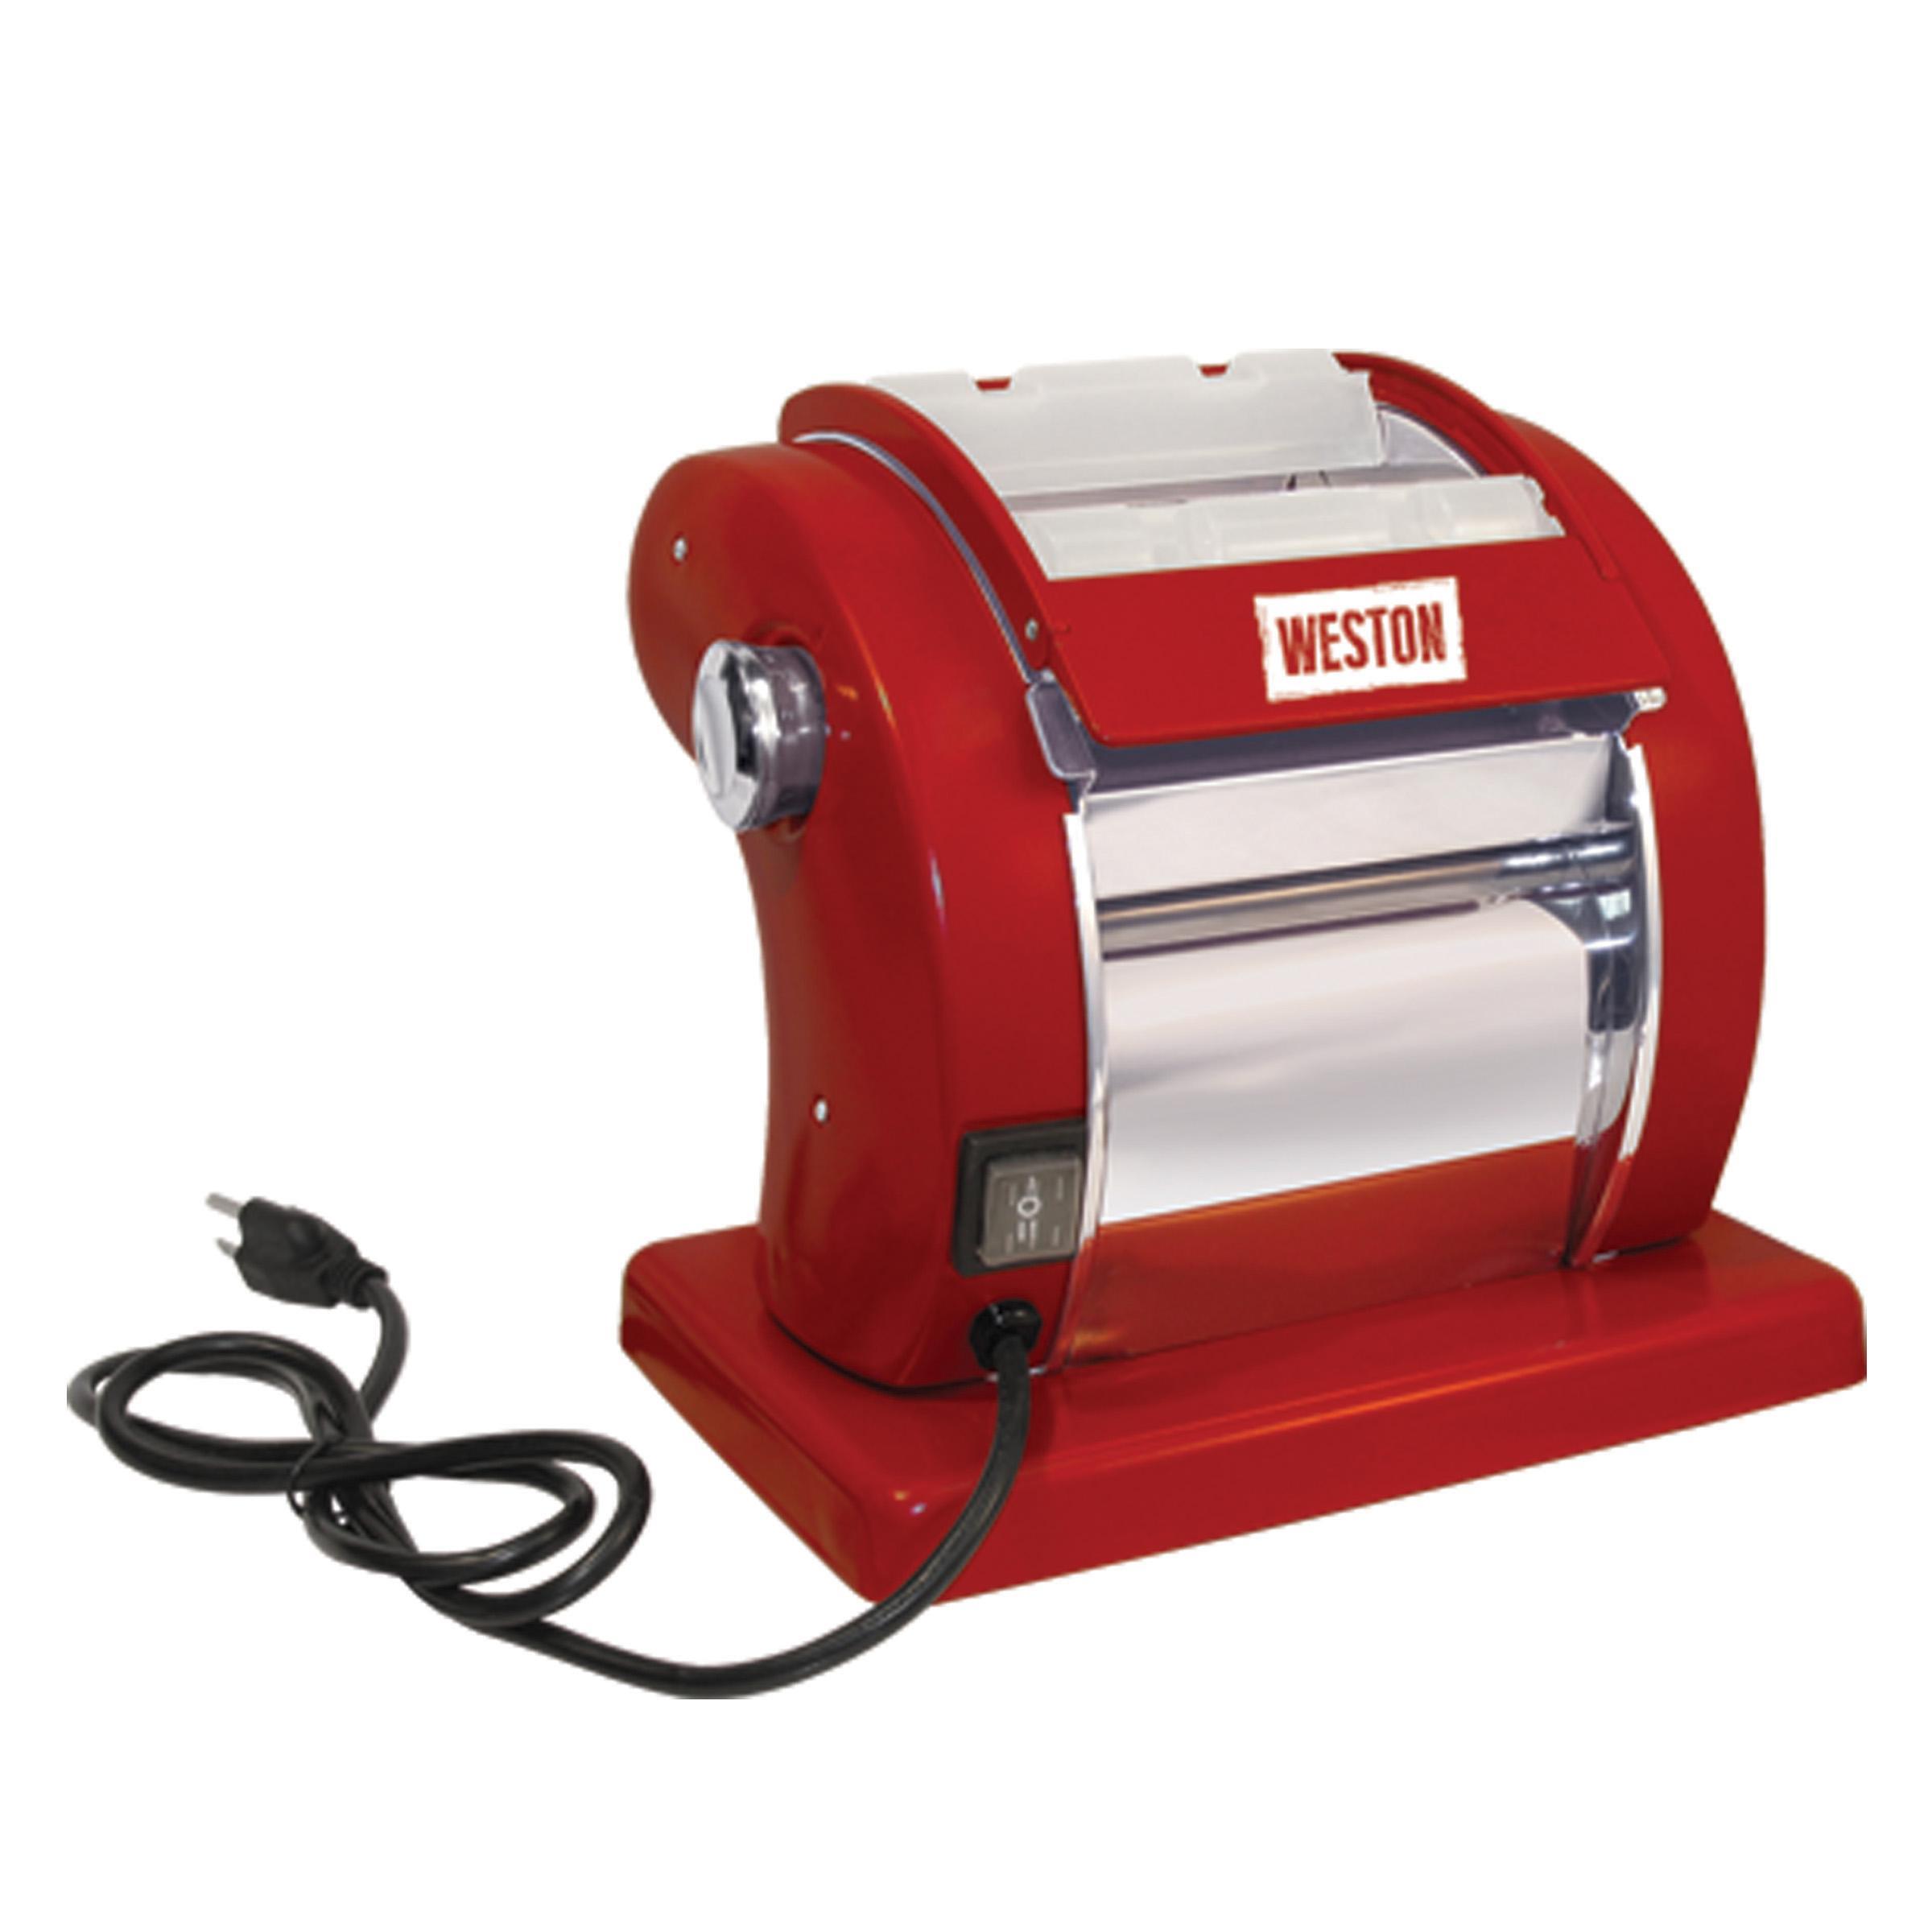 Weston 01-0601-W Roma Express Electric Pasta Machine ...